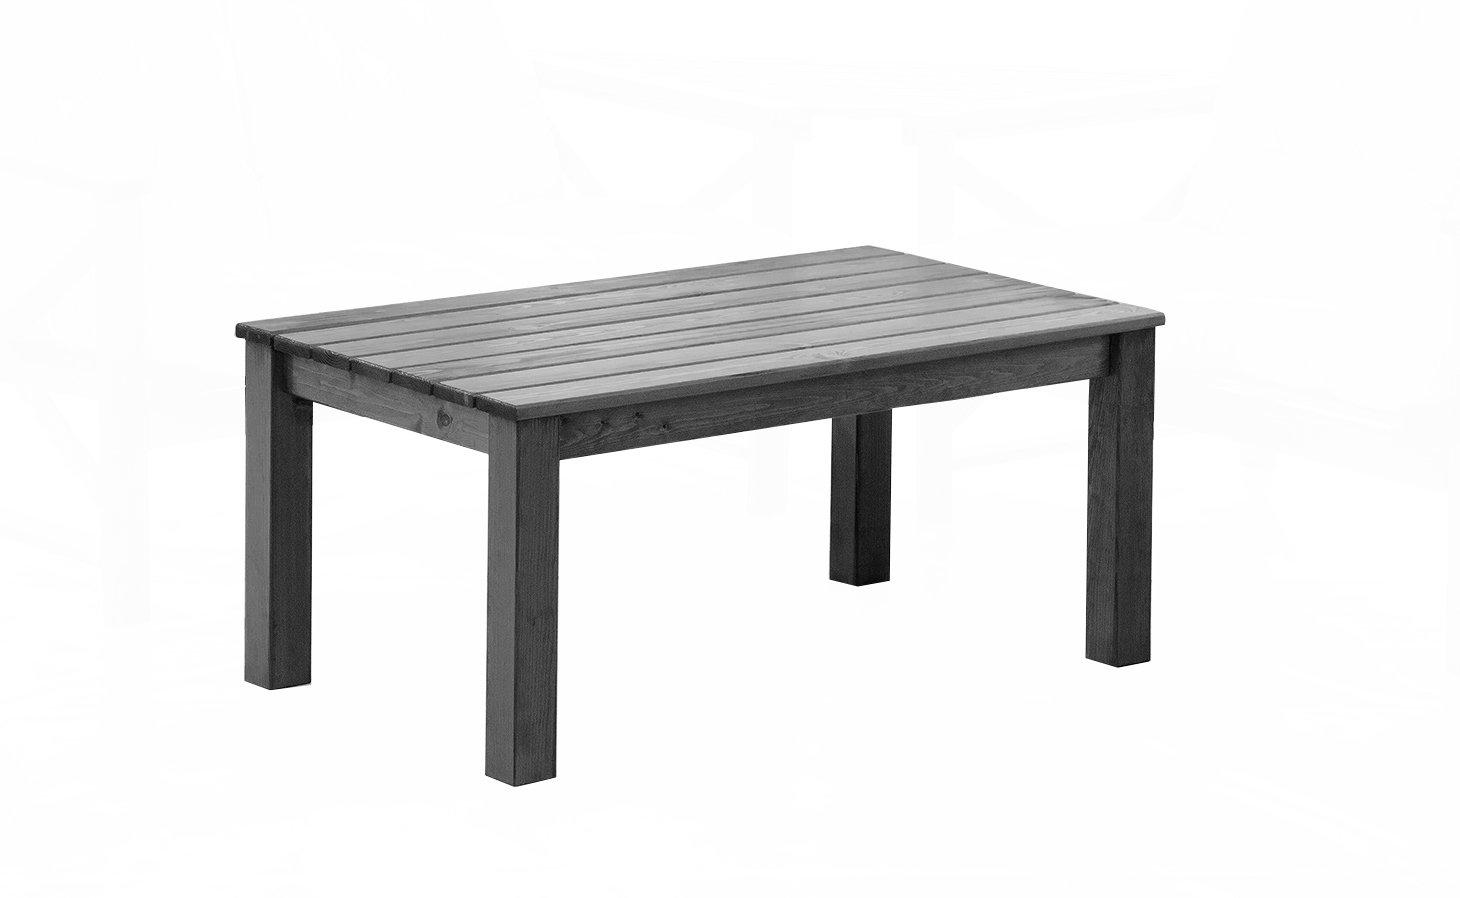 Ambientehome Loungetisch OSLO, 110 x 67 x 50 cm, grau